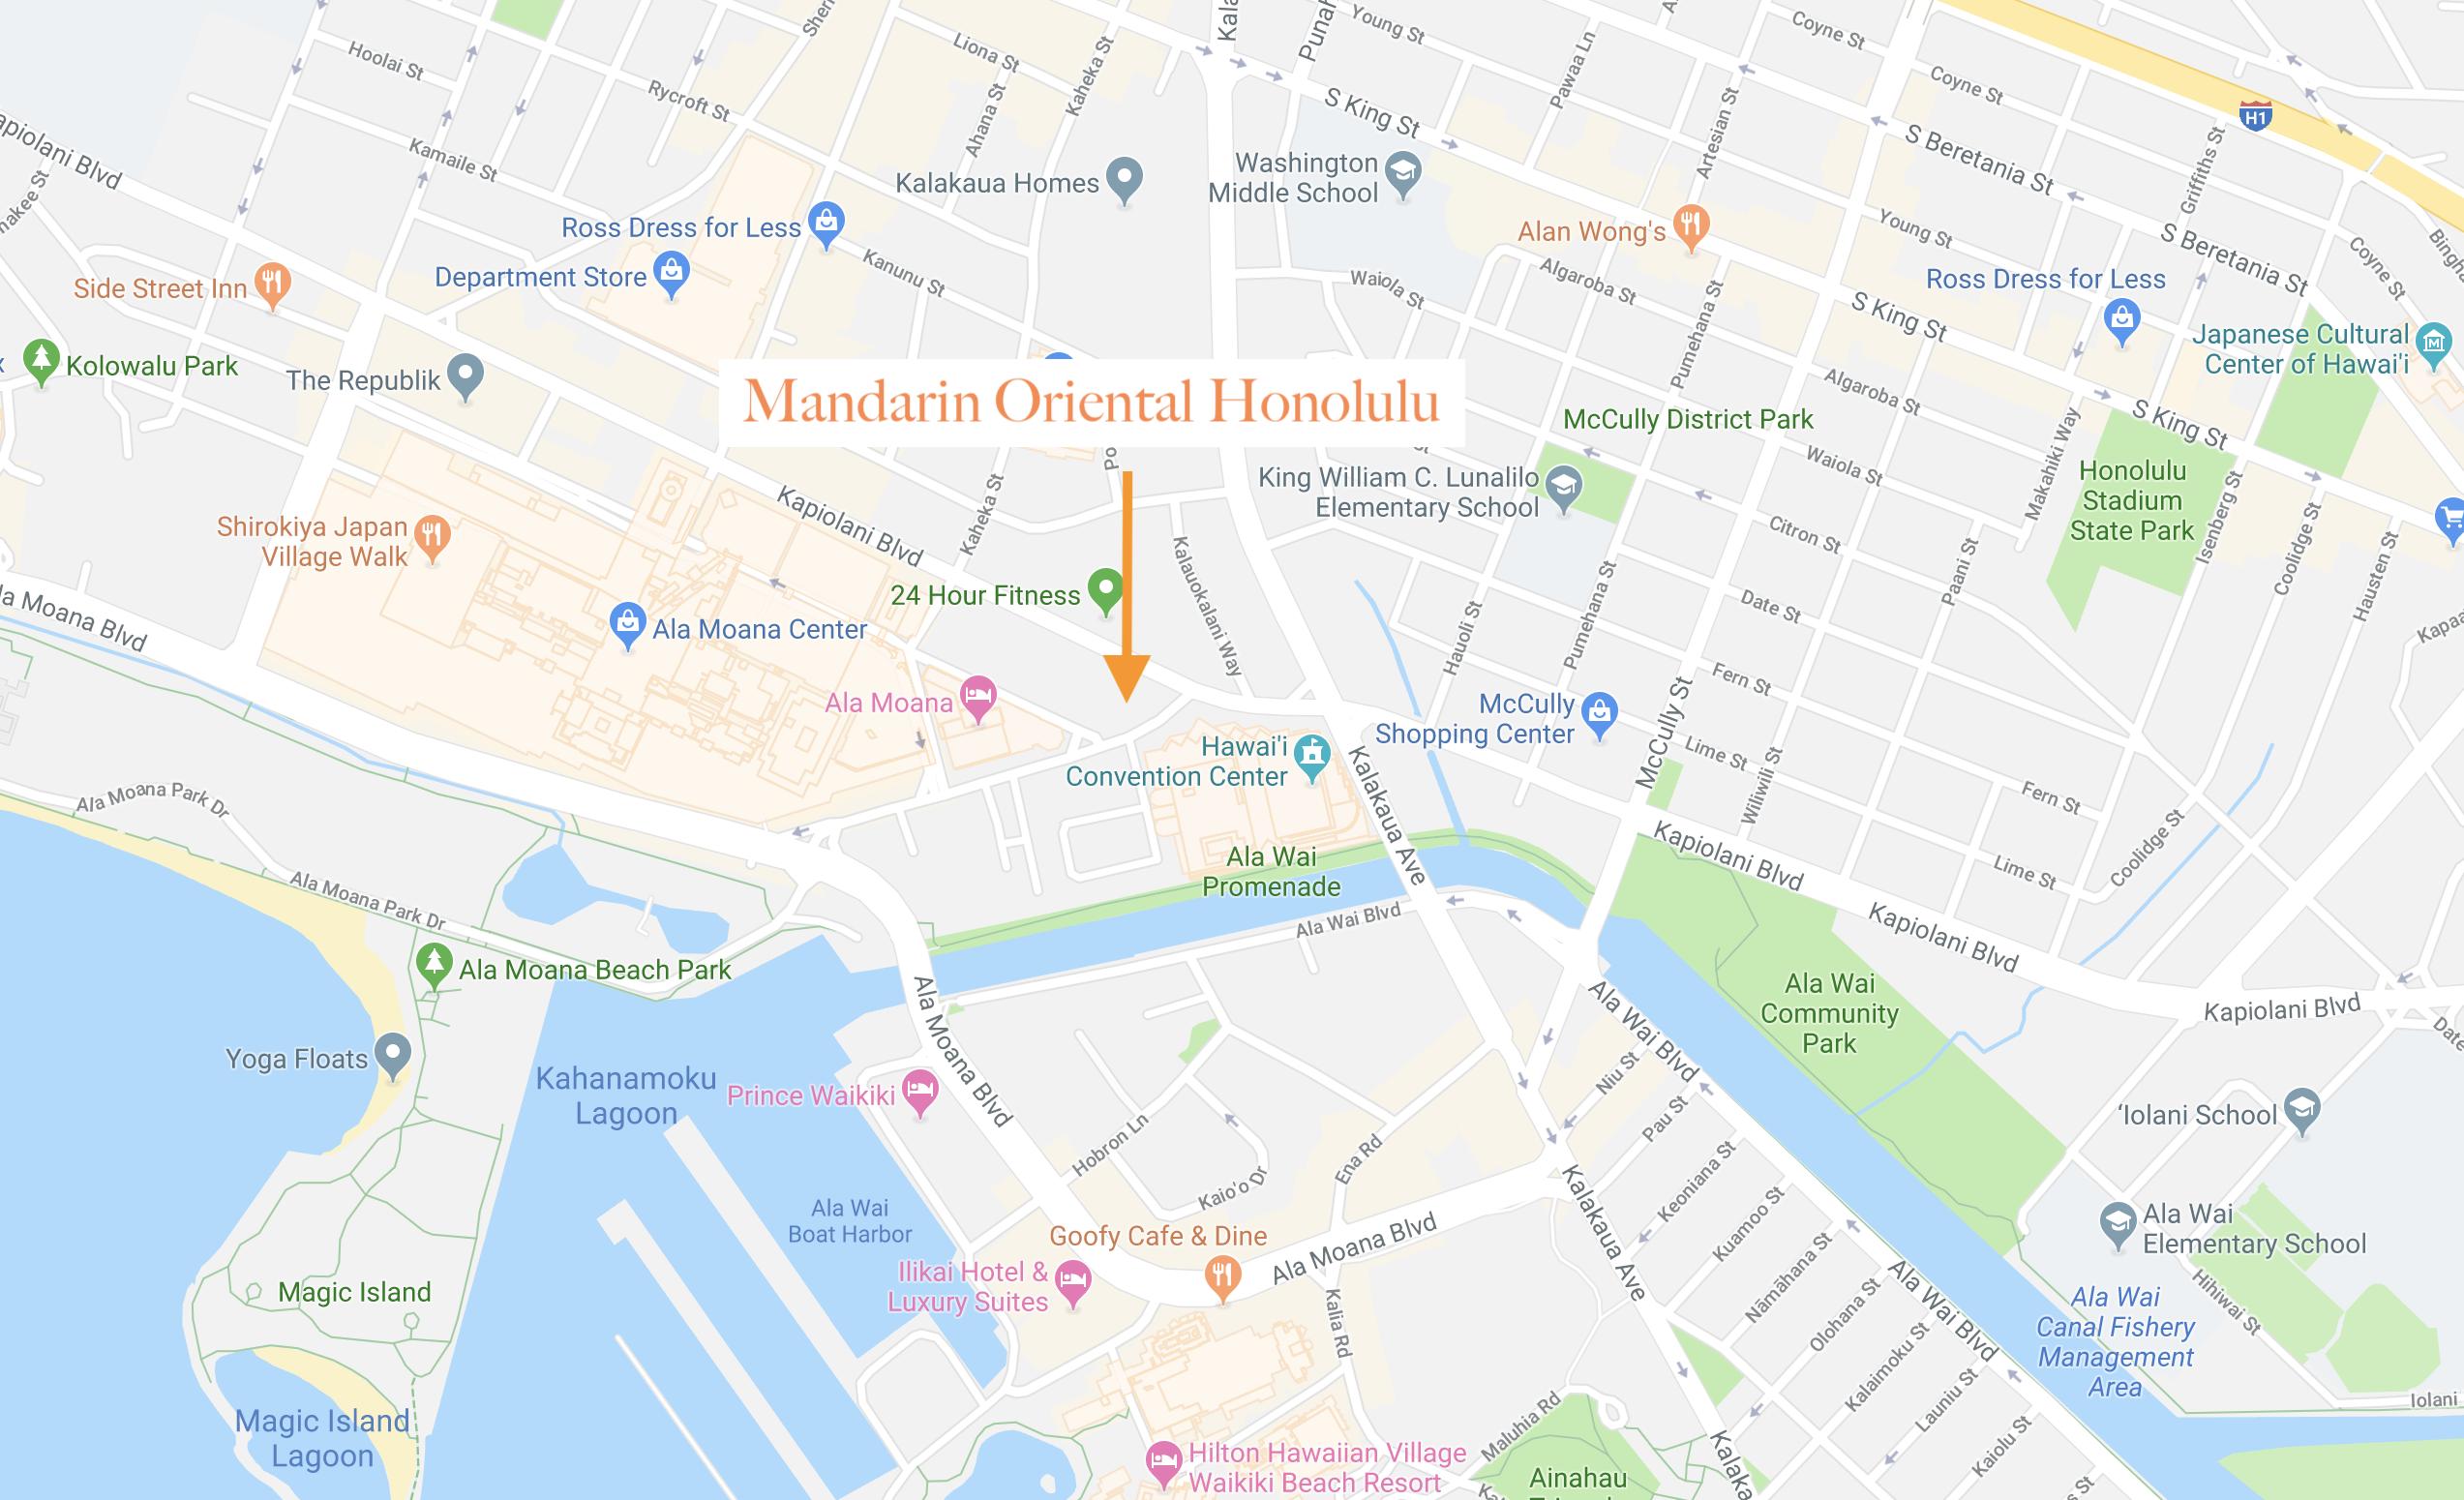 Mandarin Oriental Honolulu